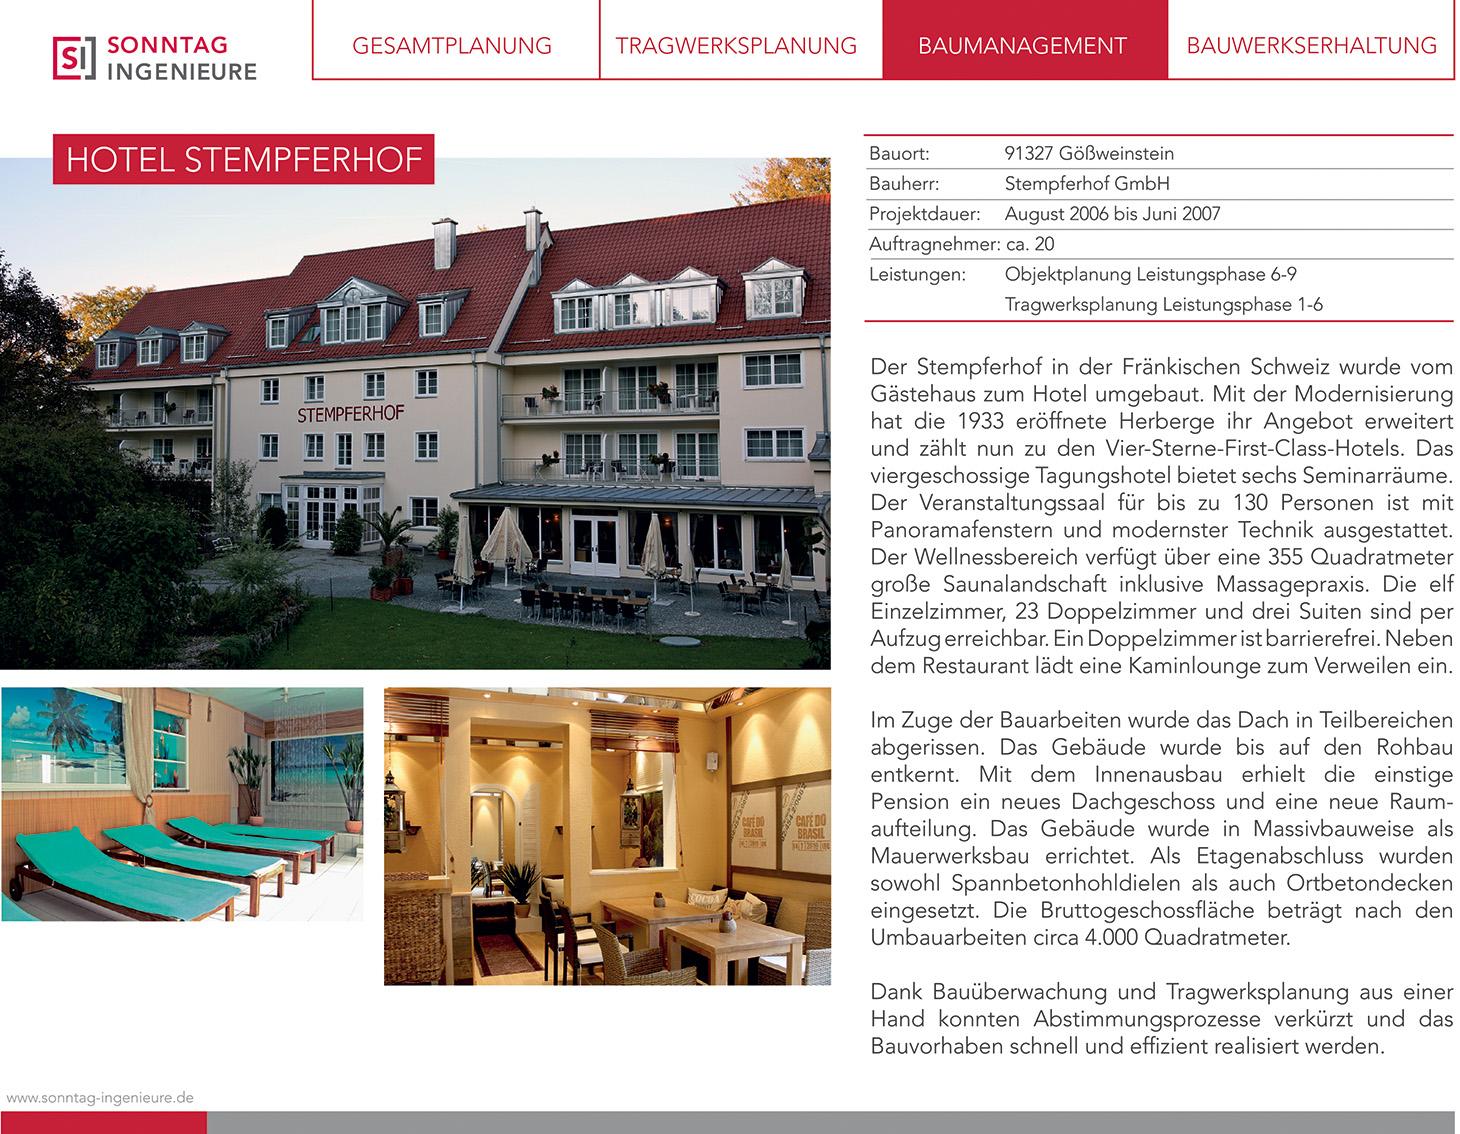 Infodatenblatt zum Bauprojekt Hotel Stempferhof